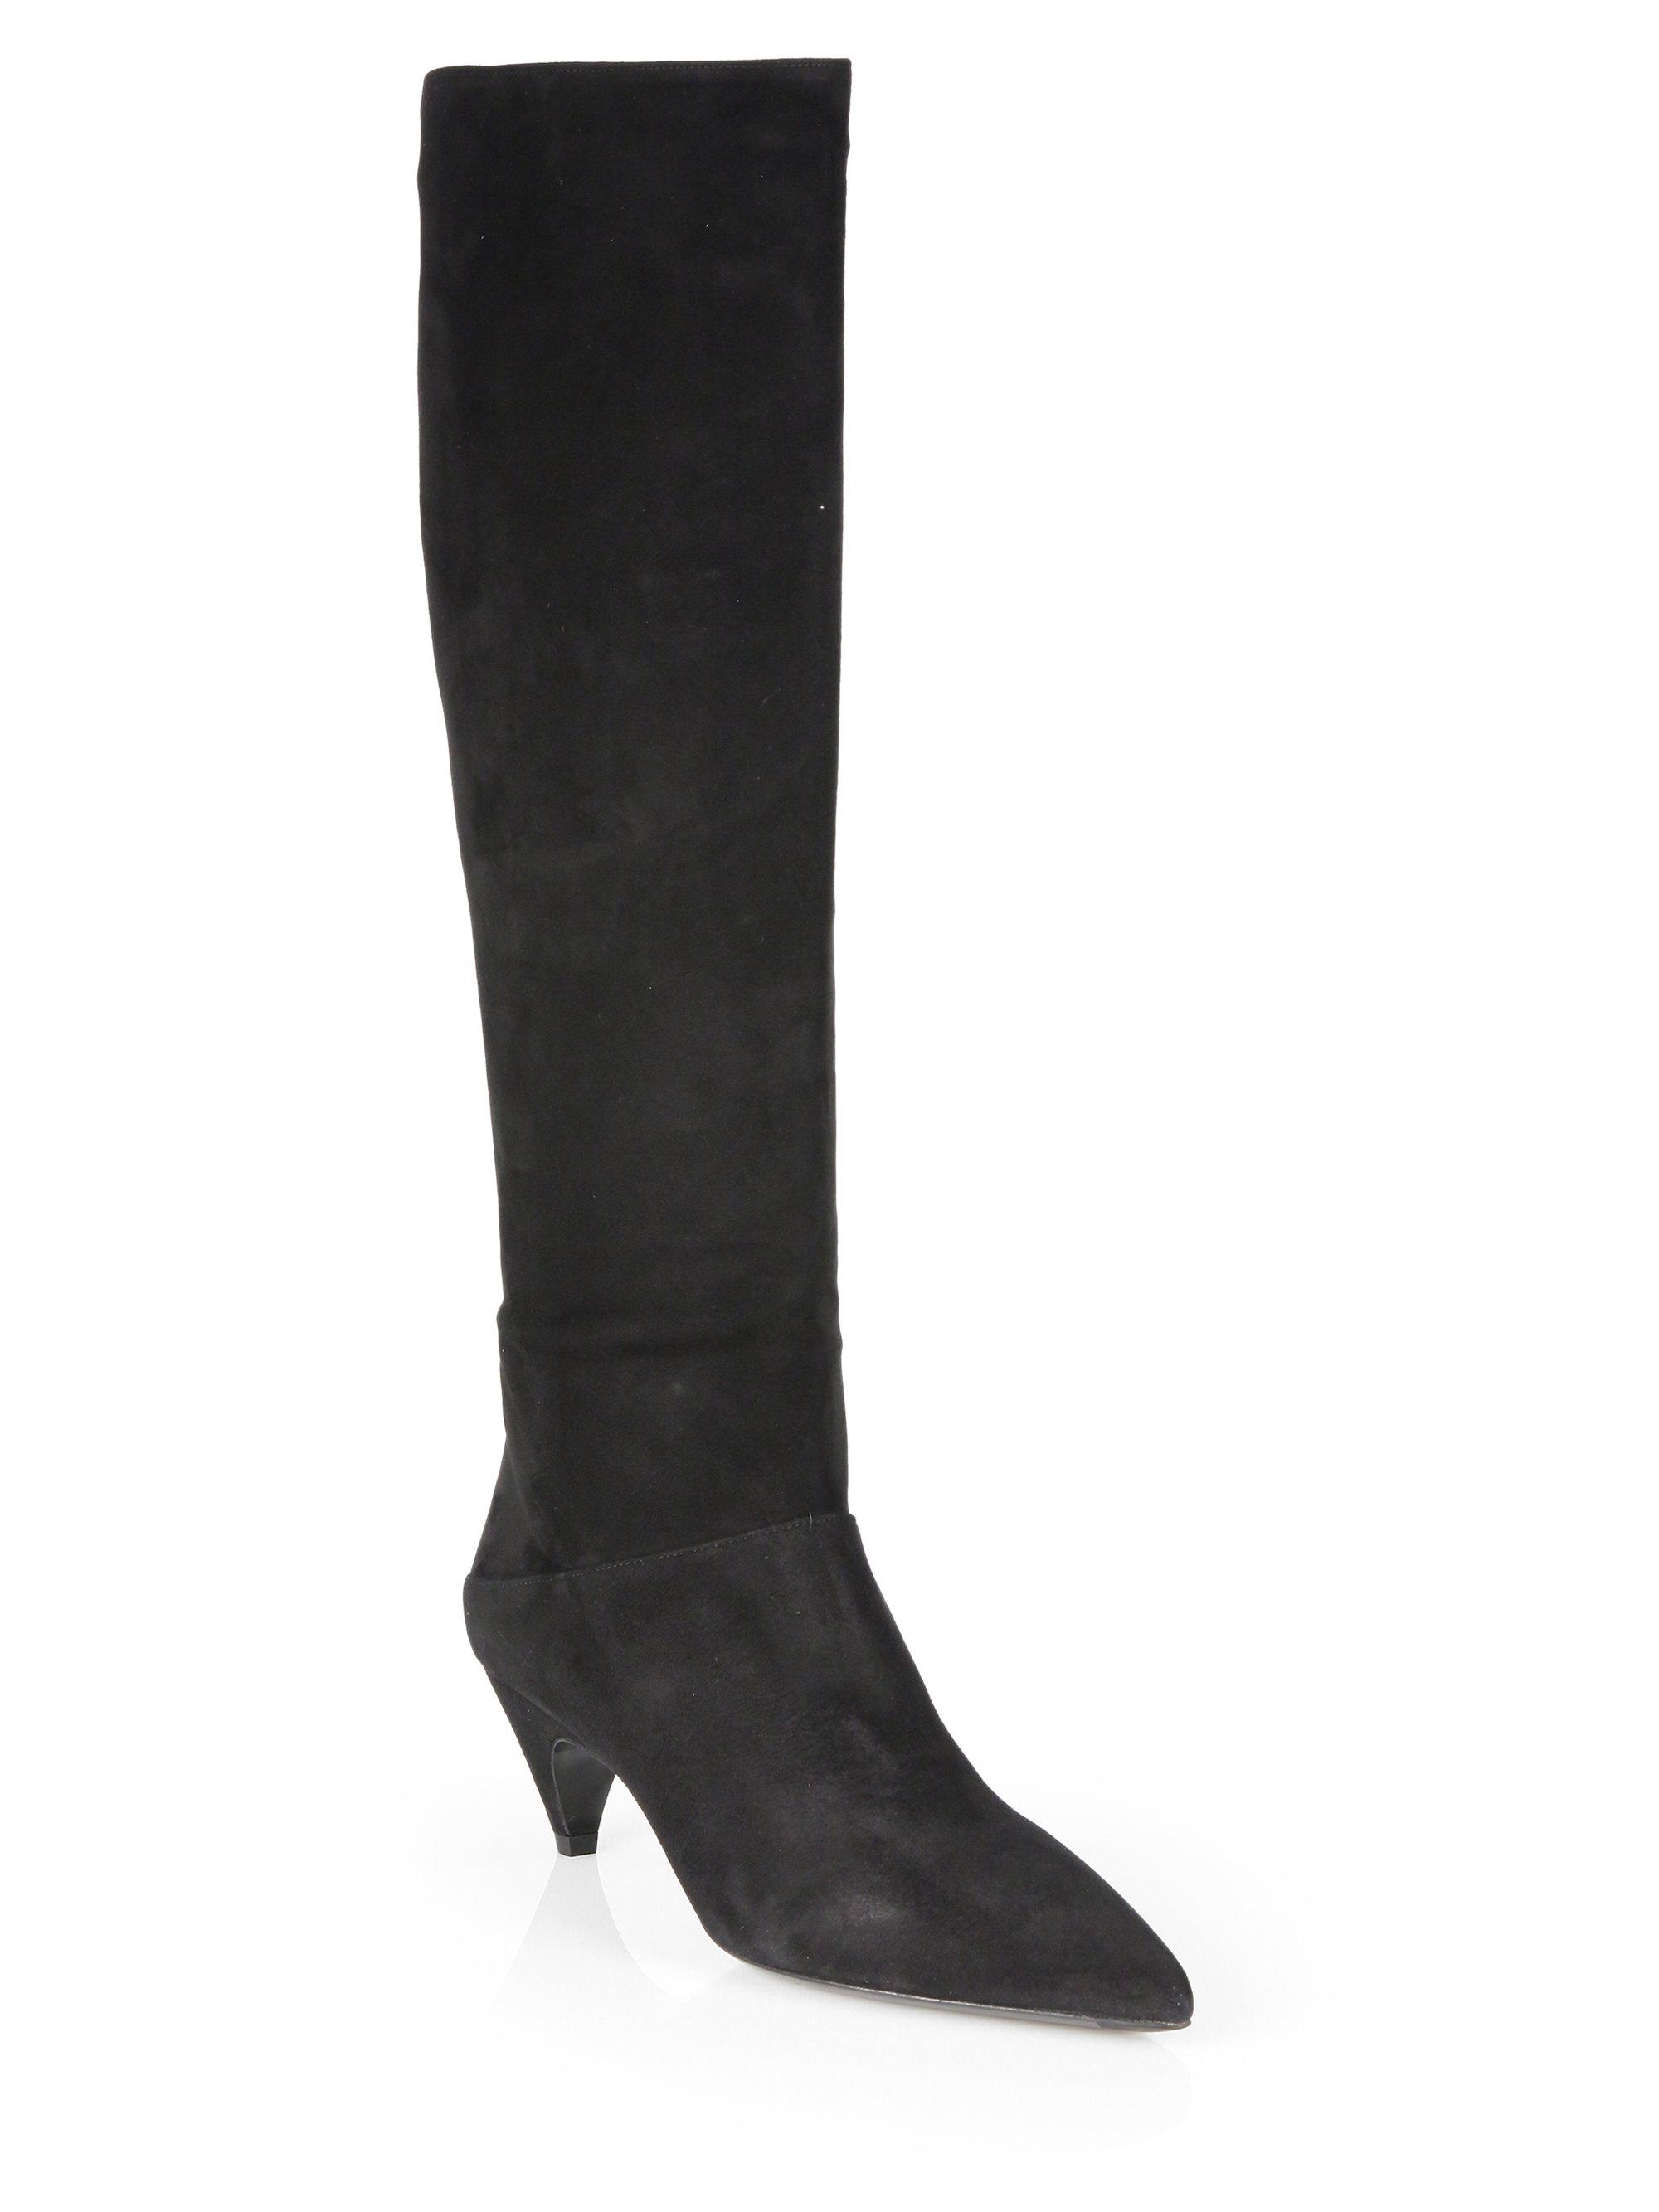 prada suede knee high boots in black lyst